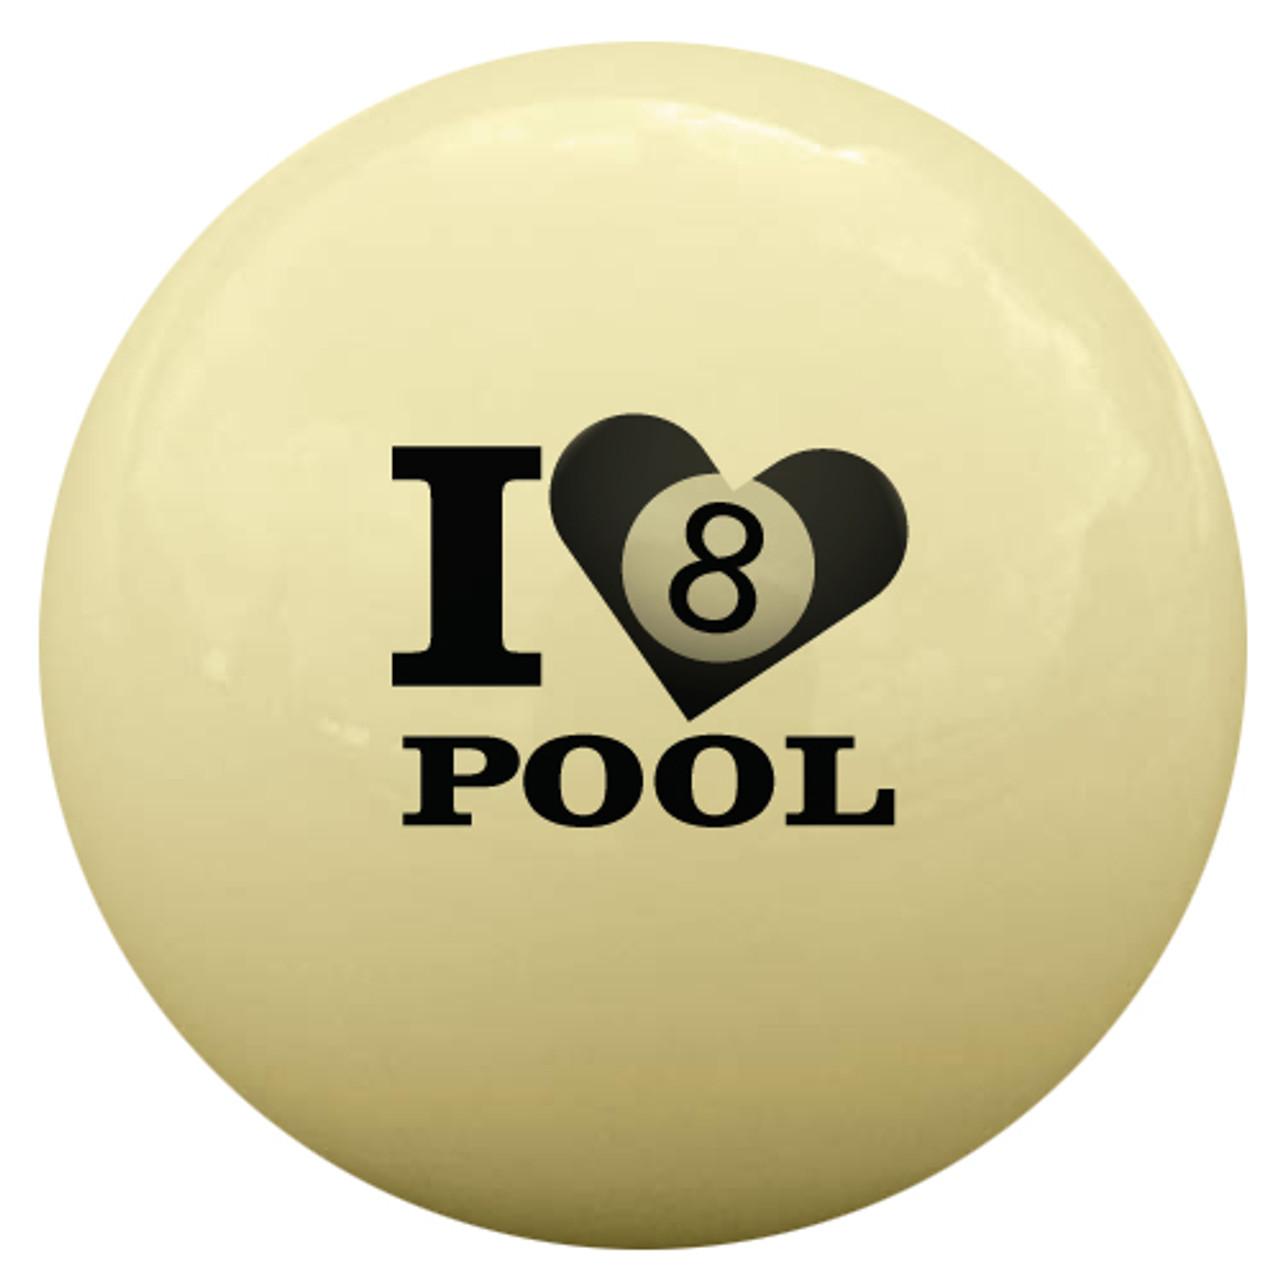 I Love Pool 8-Ball Cue Ball